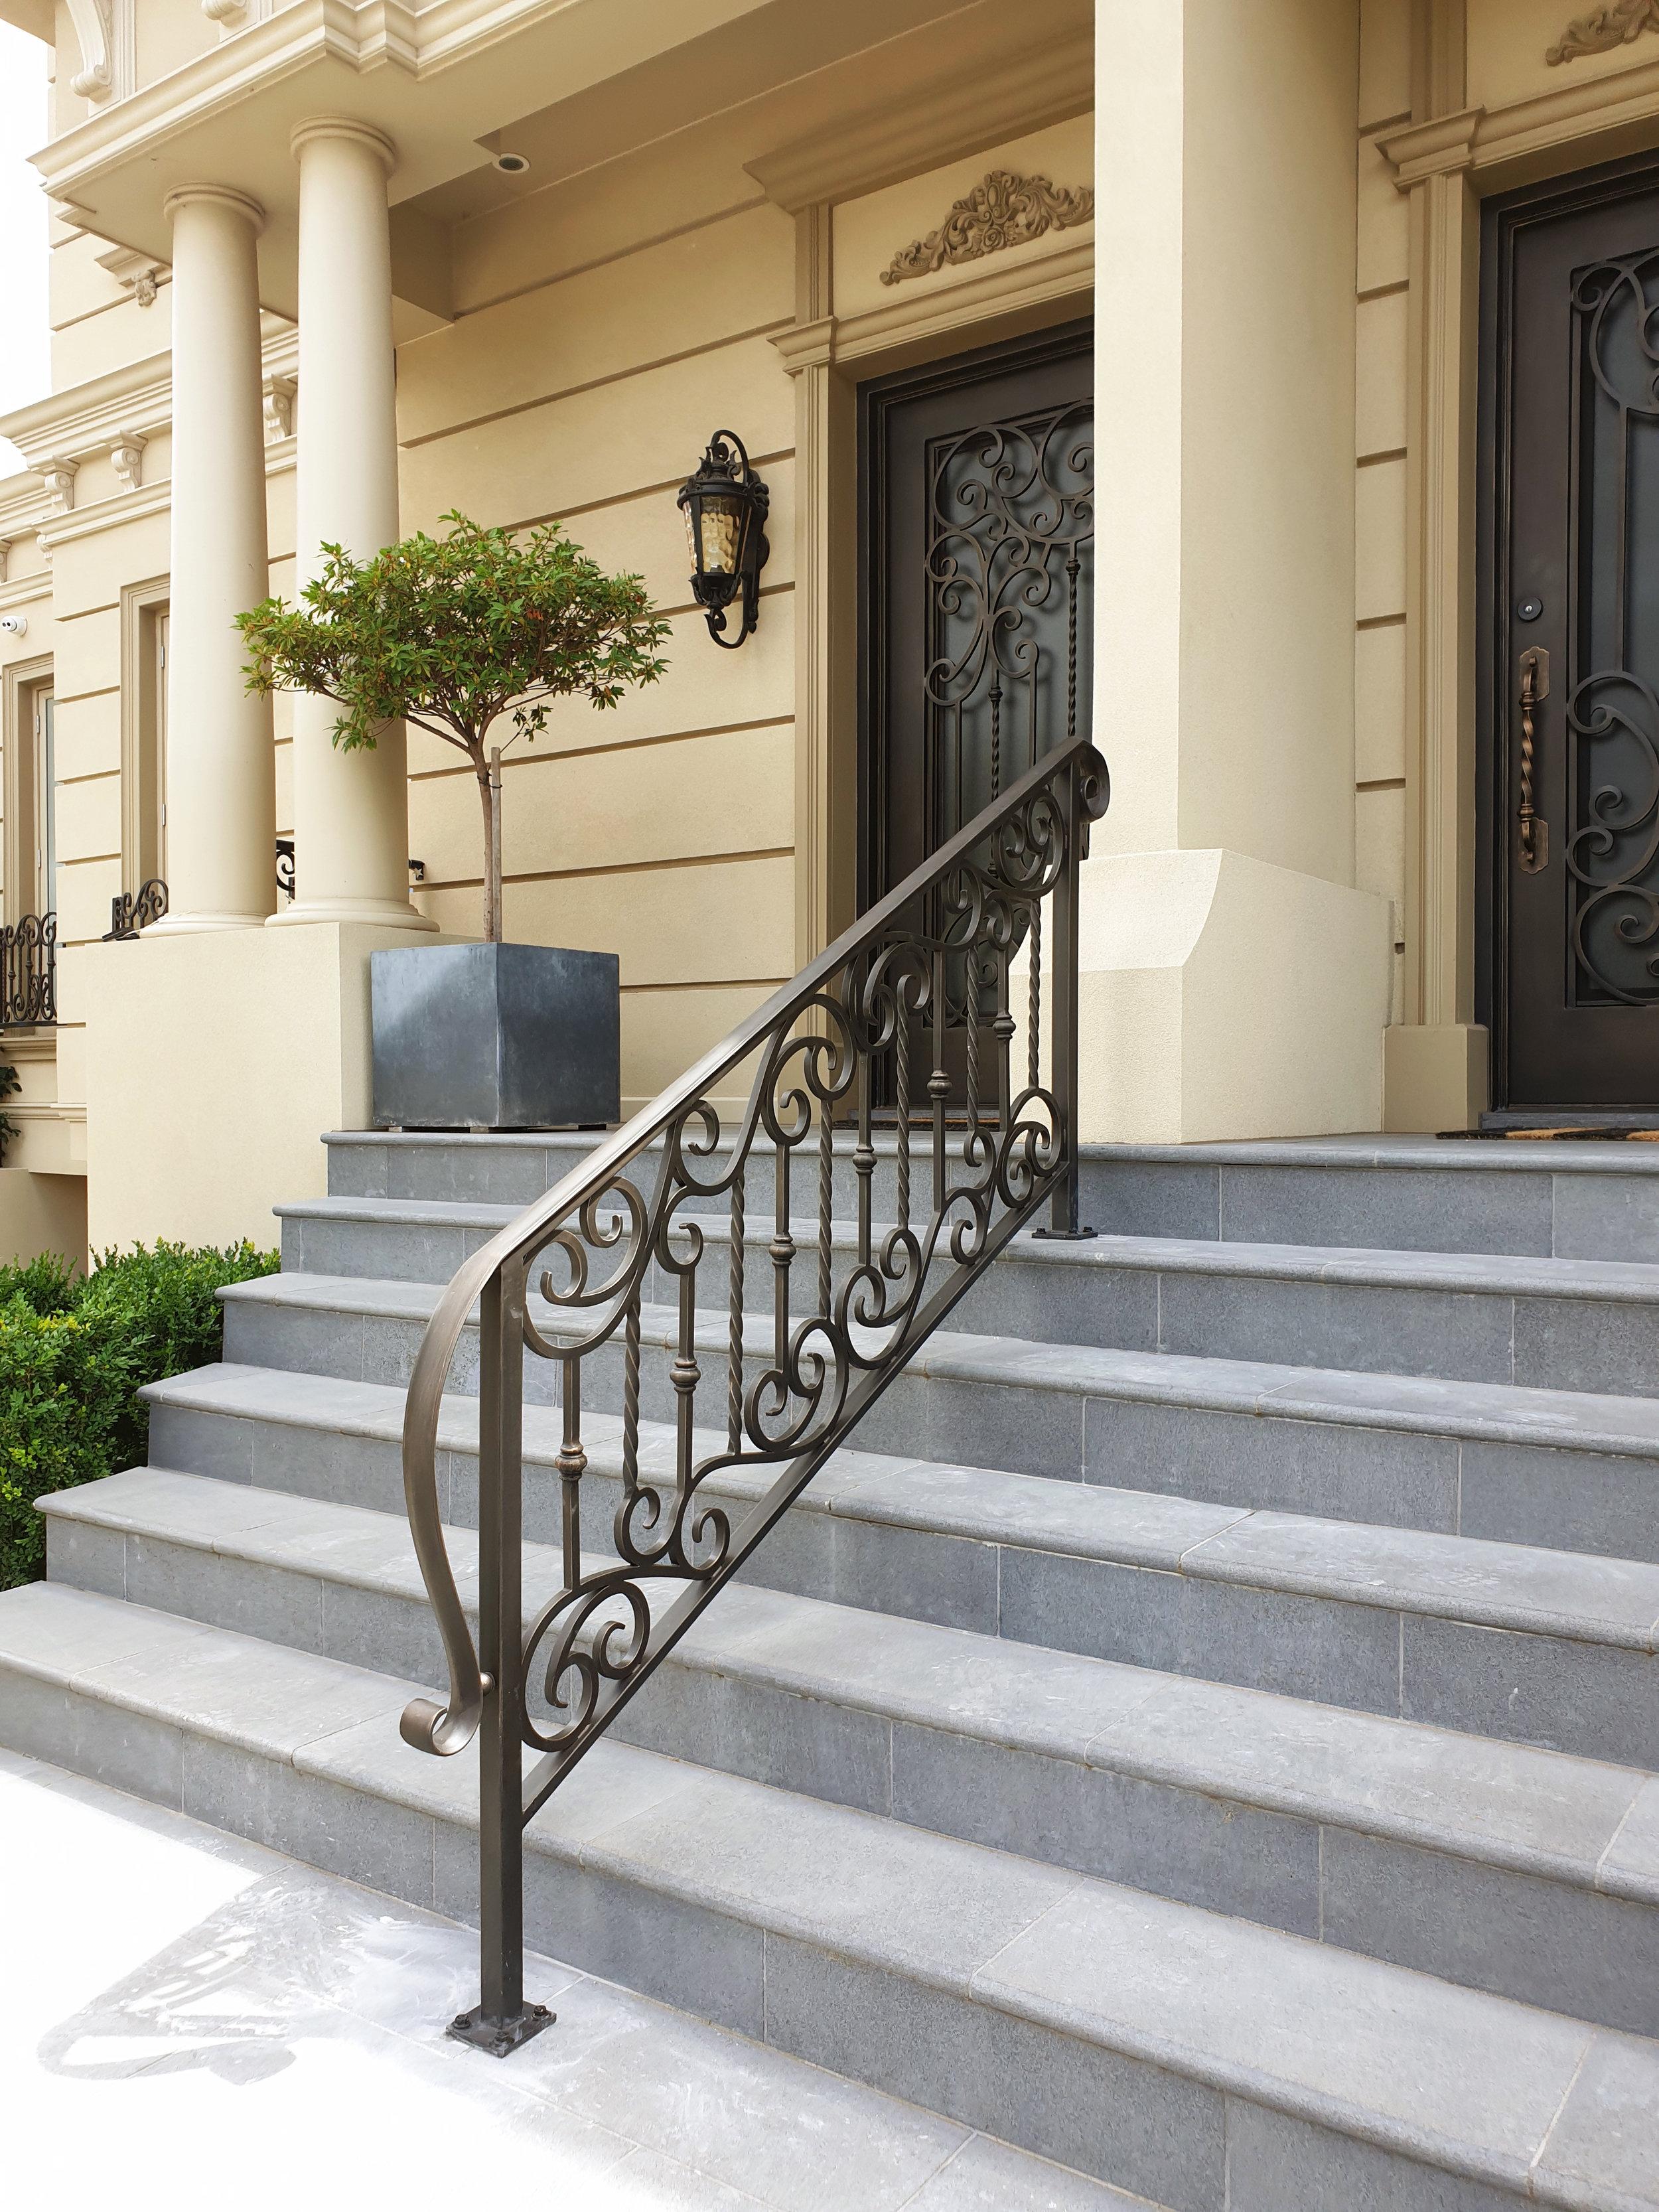 Wrought Iron railings | Adoore Iron Designs